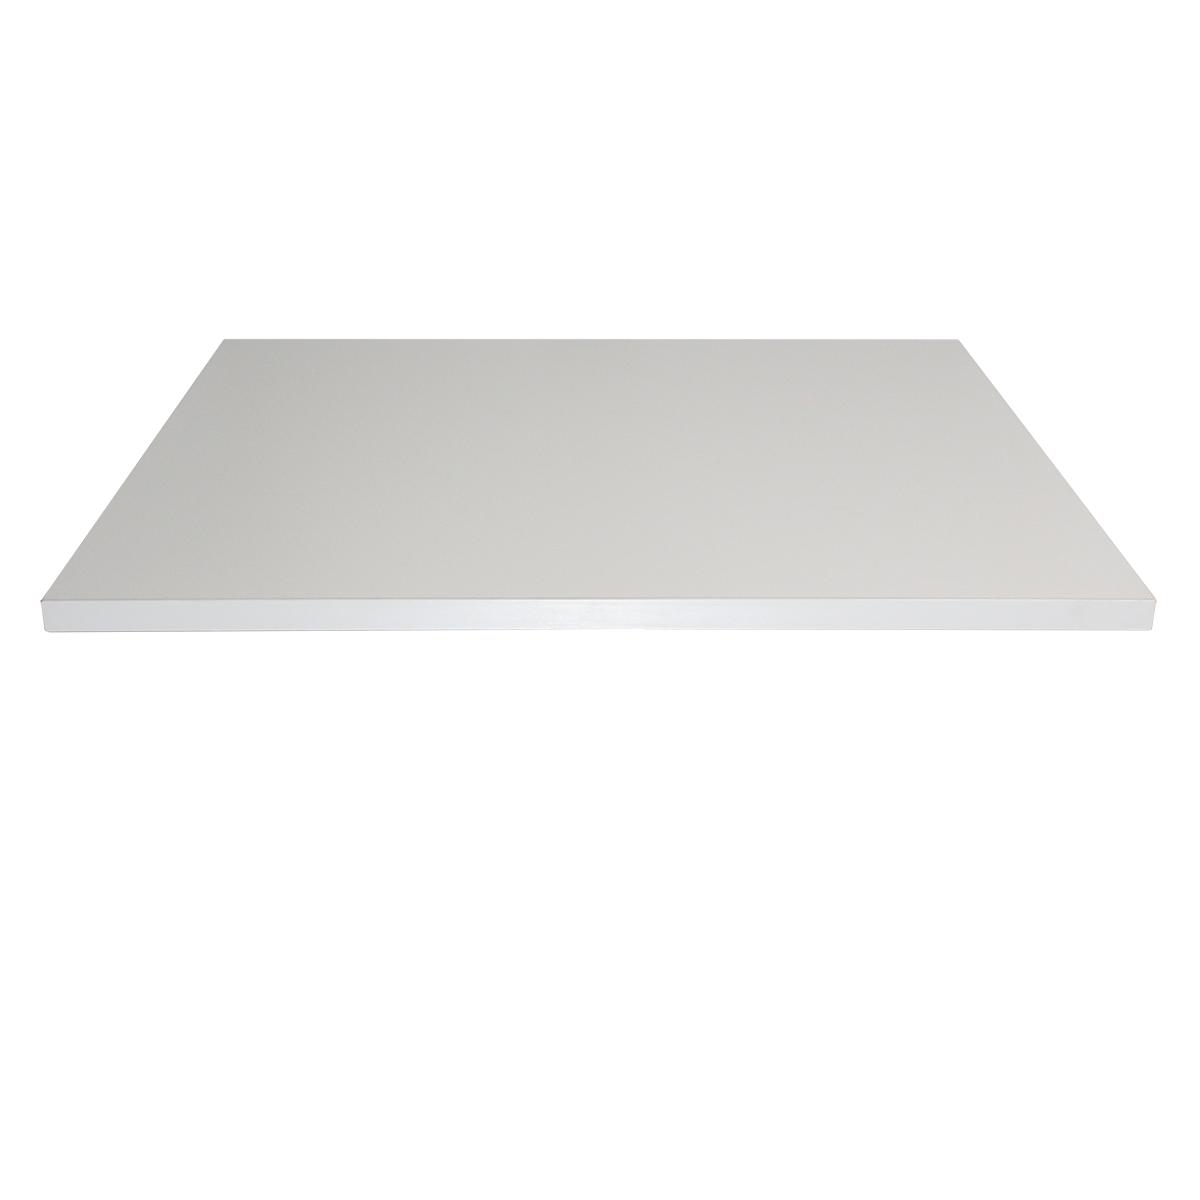 weiss 80x70x2 5cm tischplatte tischplatten ingastro restaurant m bel direkt vom importeur. Black Bedroom Furniture Sets. Home Design Ideas